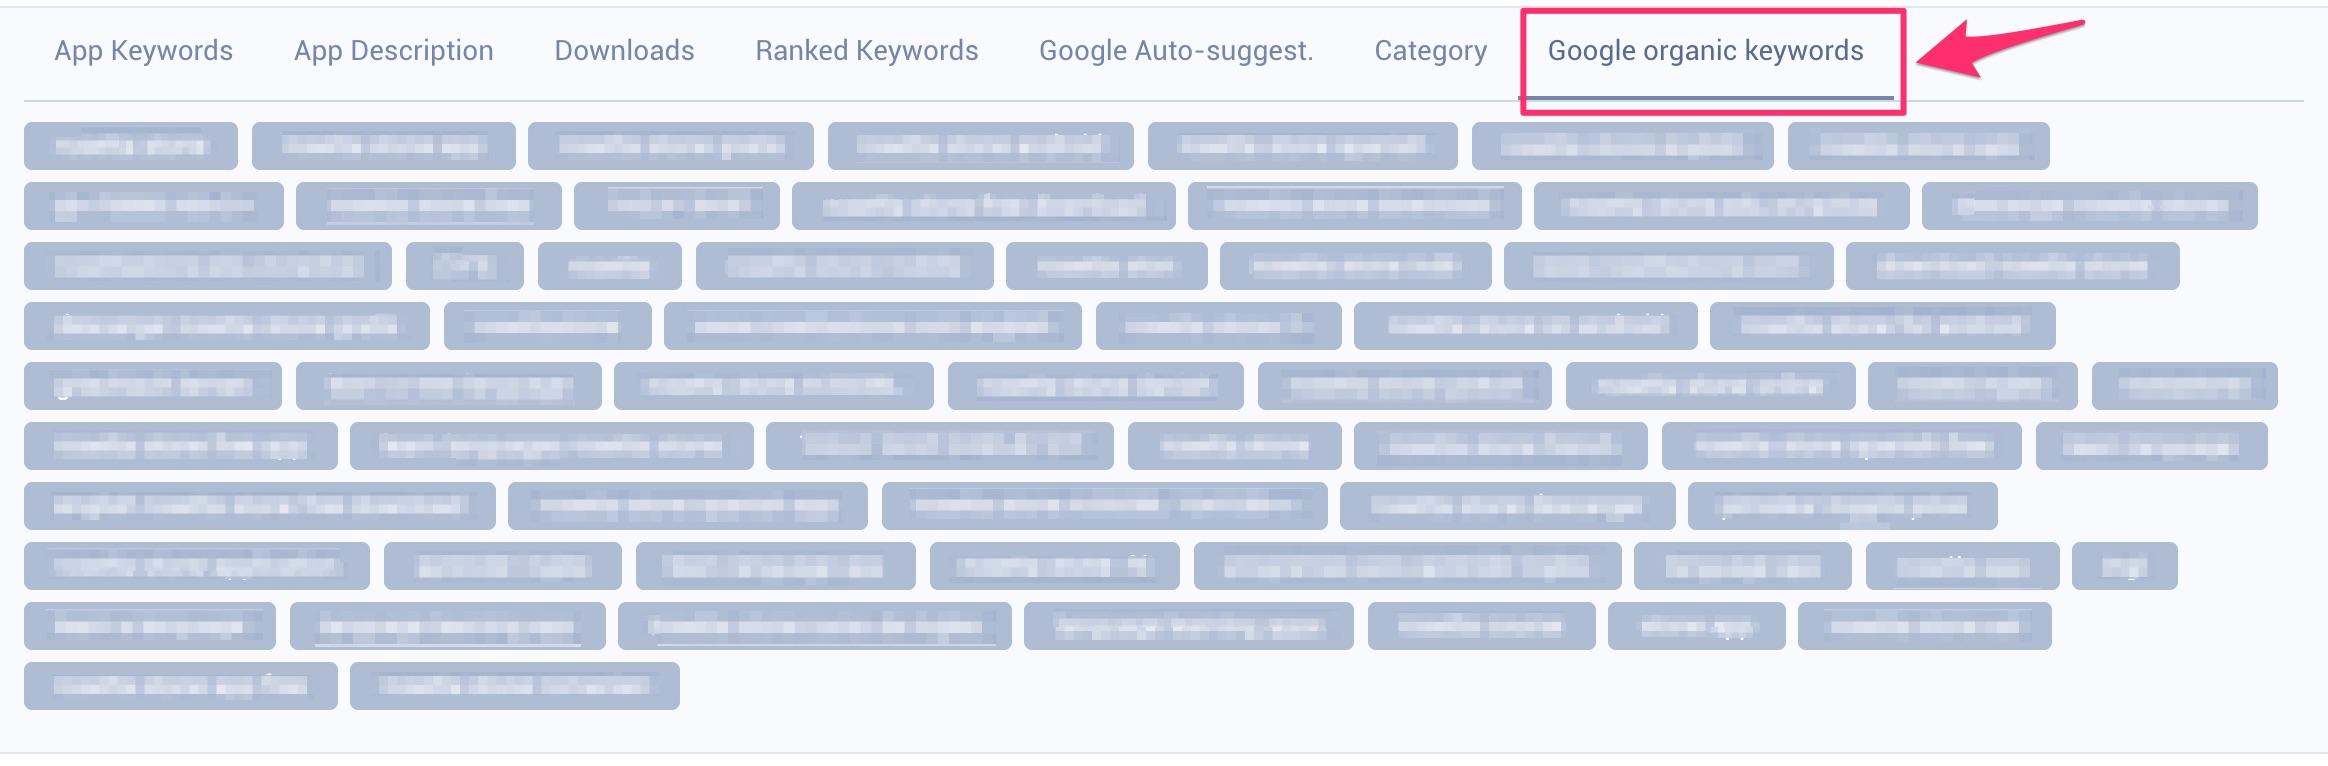 Google Search Organic Keywords